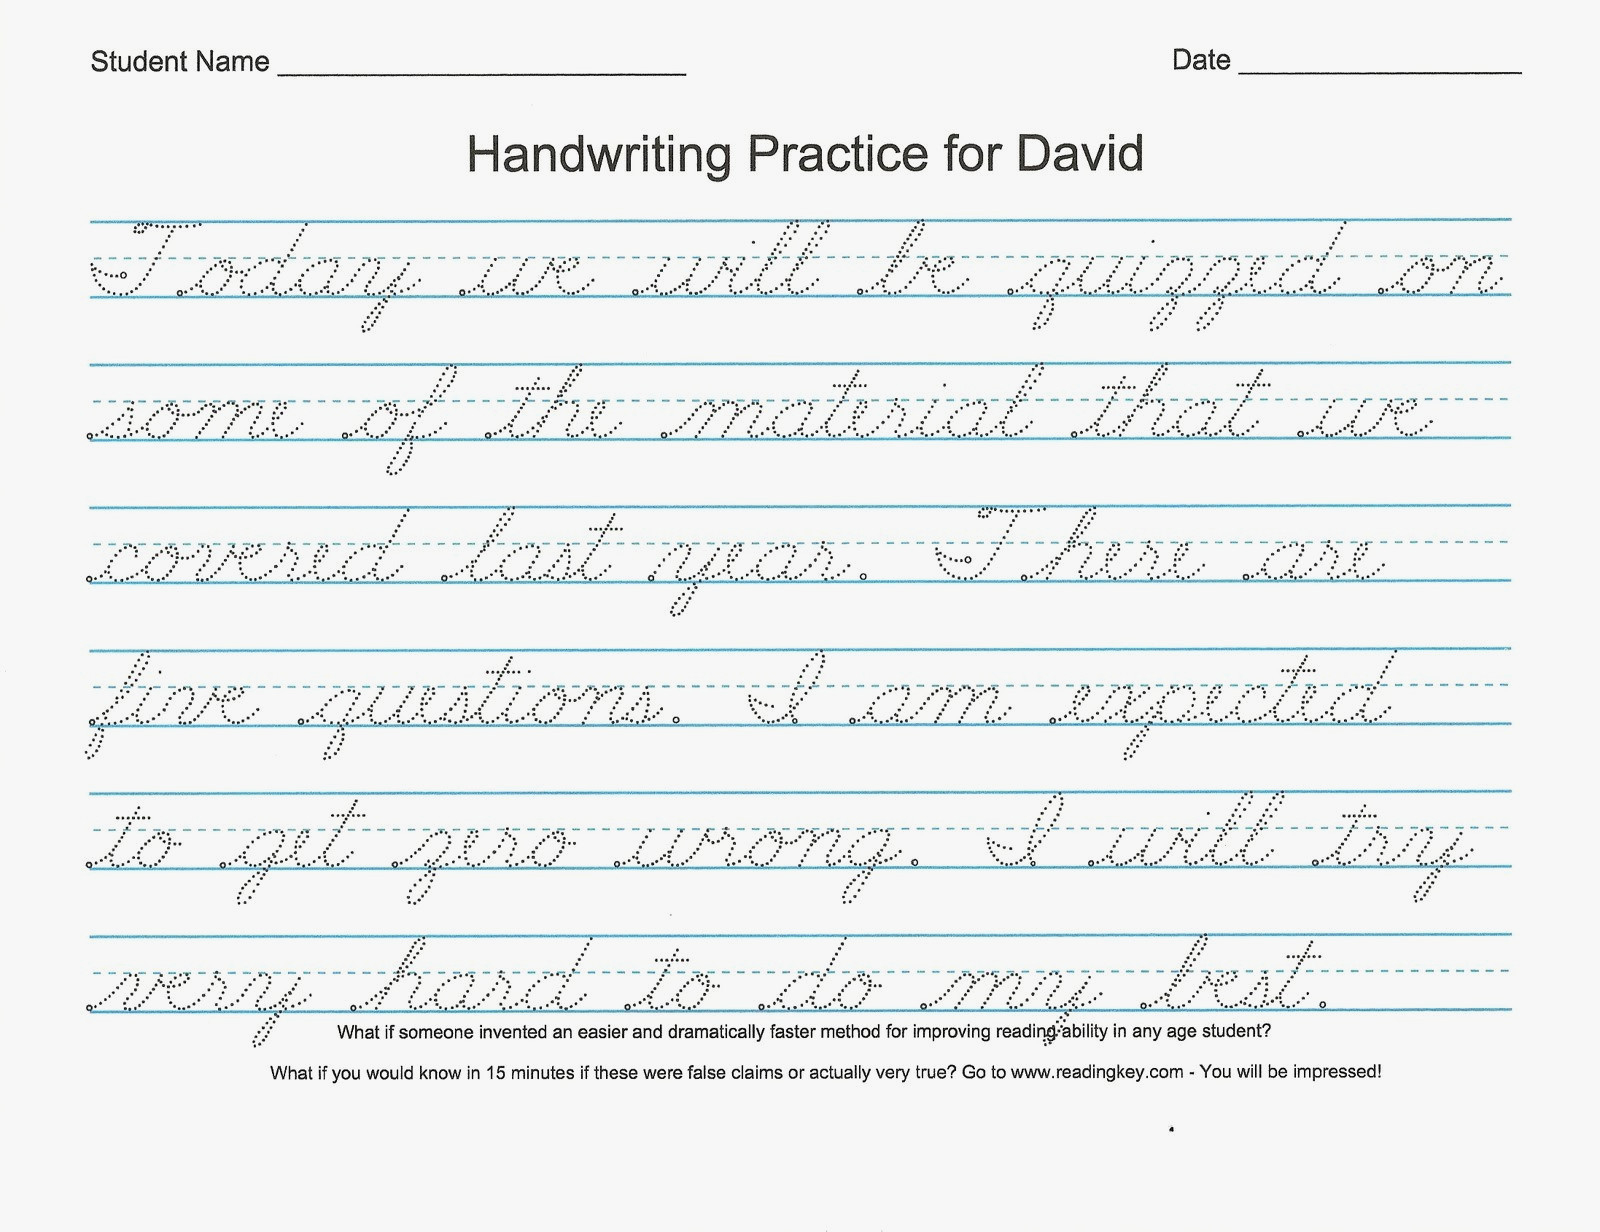 54 Unique Of Free Printable Cursive Handwriting Worksheets Pic | Free Printable Worksheets Handwriting Practice